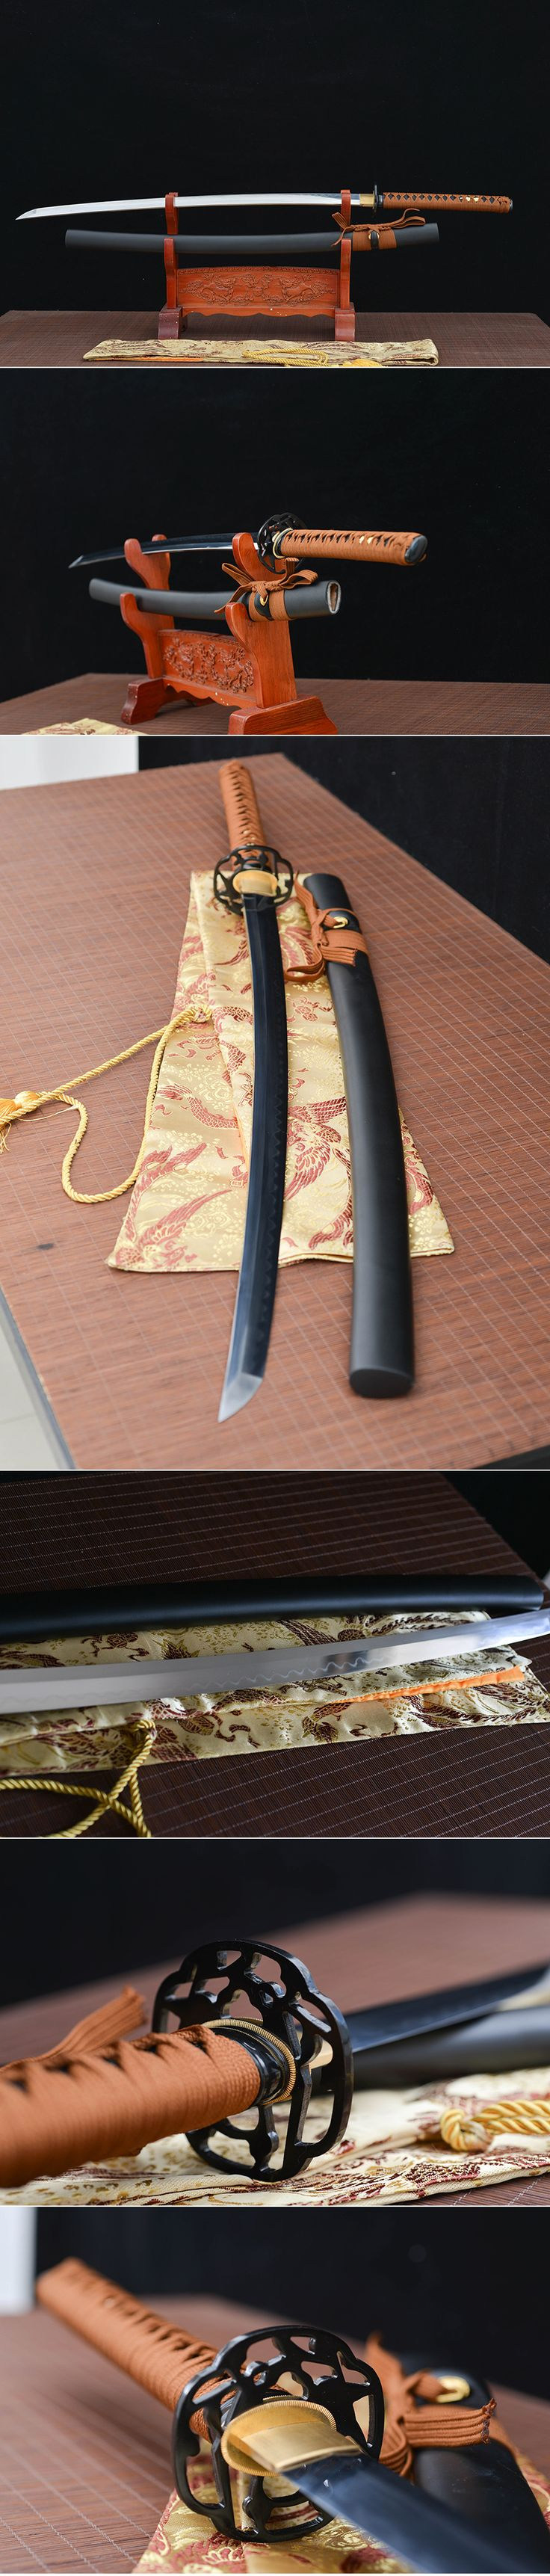 The beautiful katana